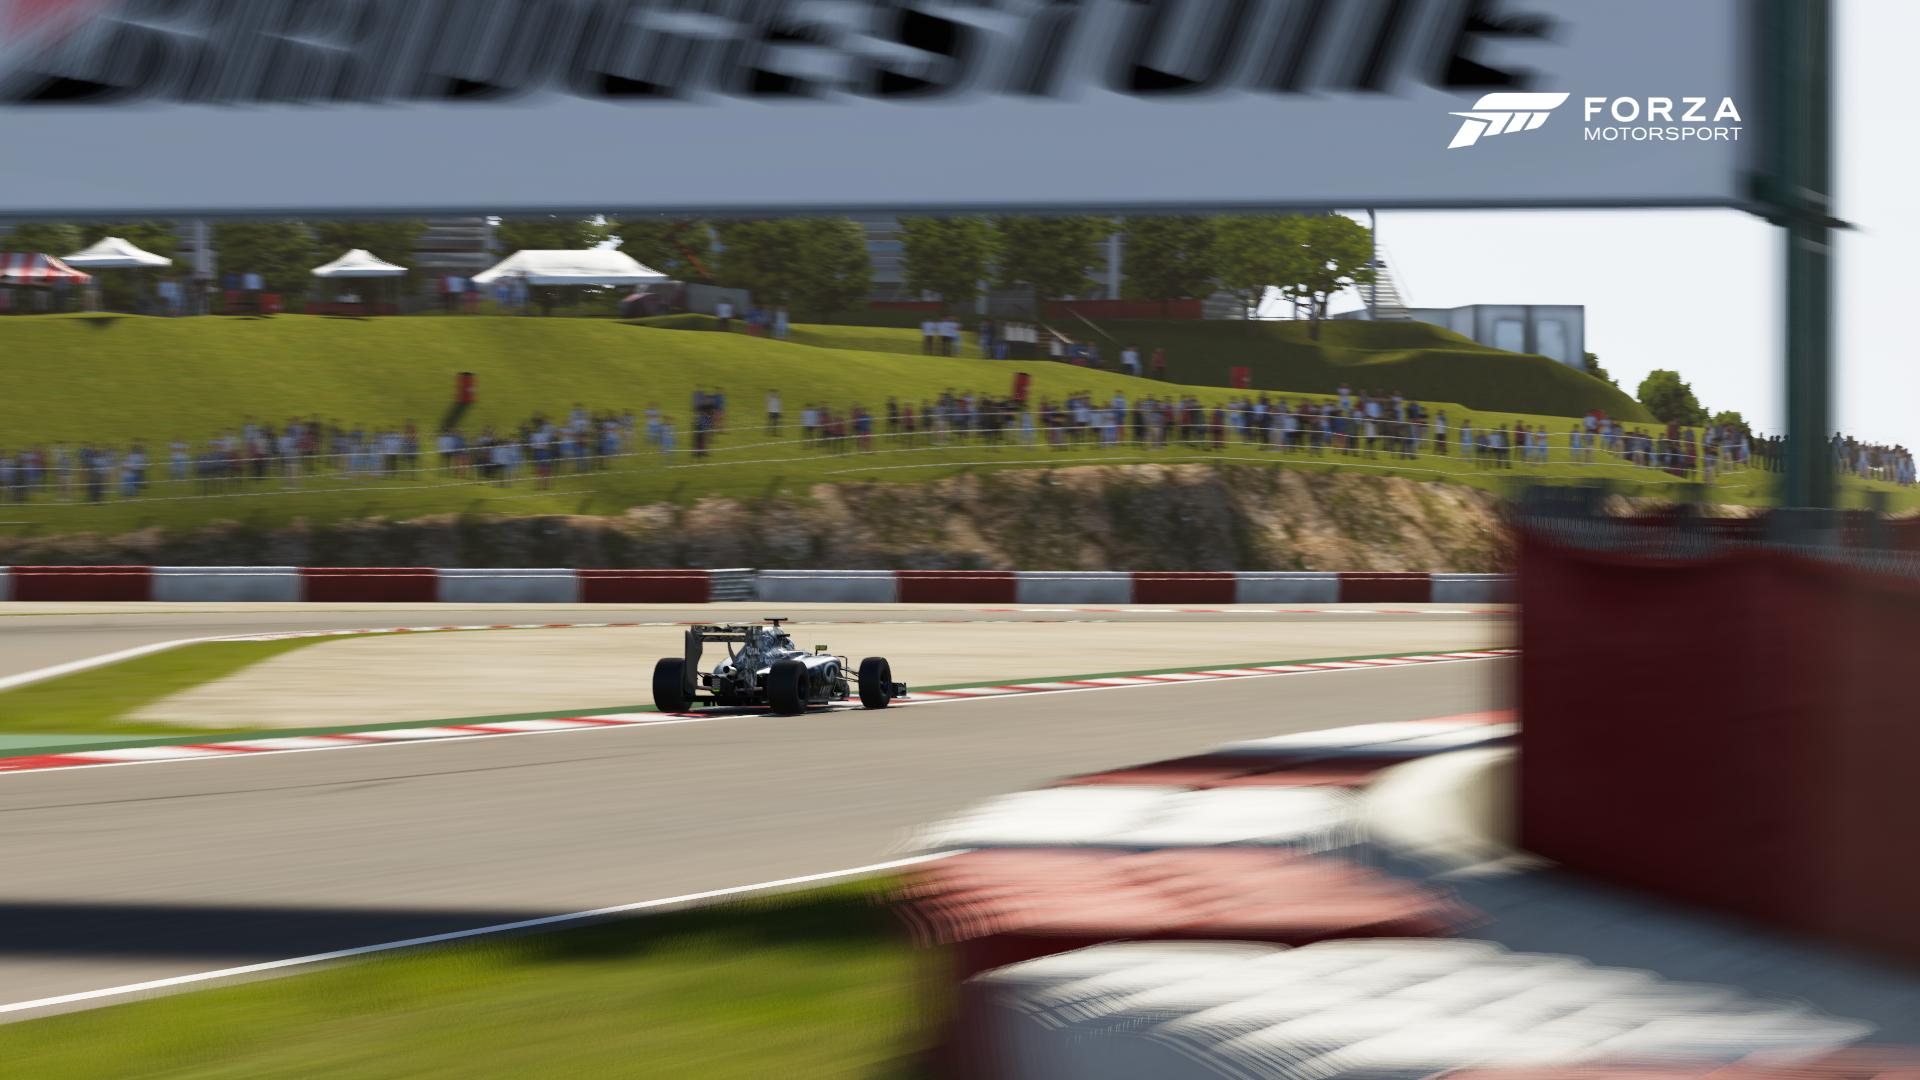 Forza Motorsport 6 (3).png